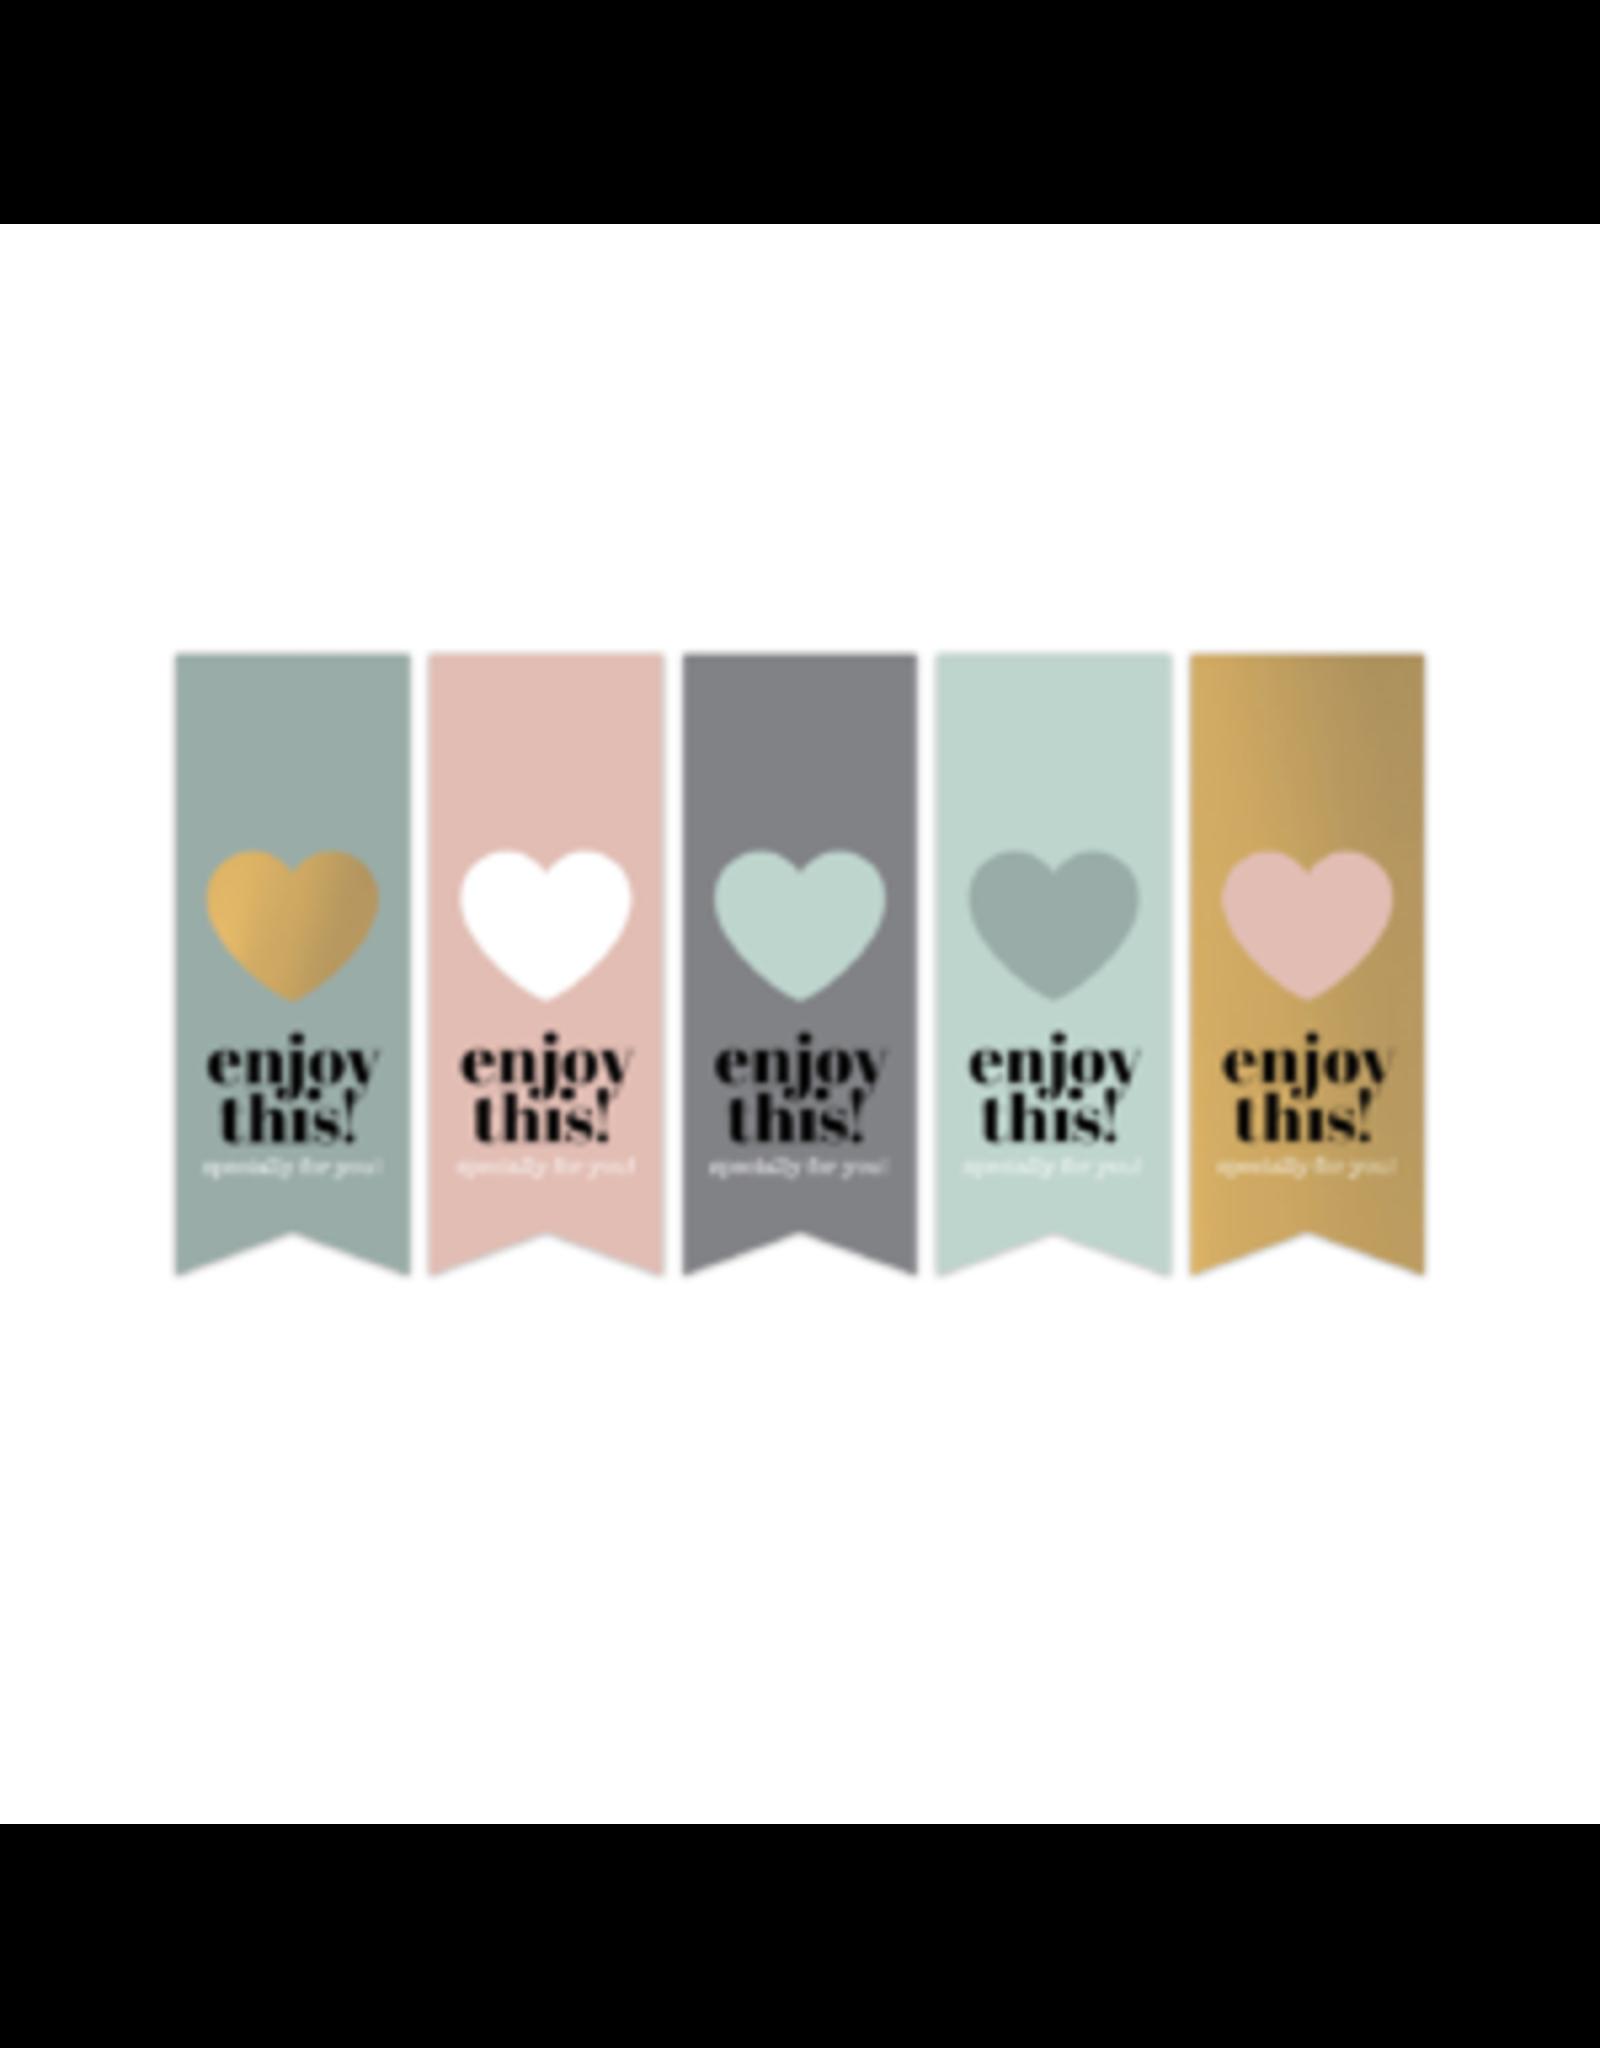 Stickers 5st. vlaggetjes hart goudfolie